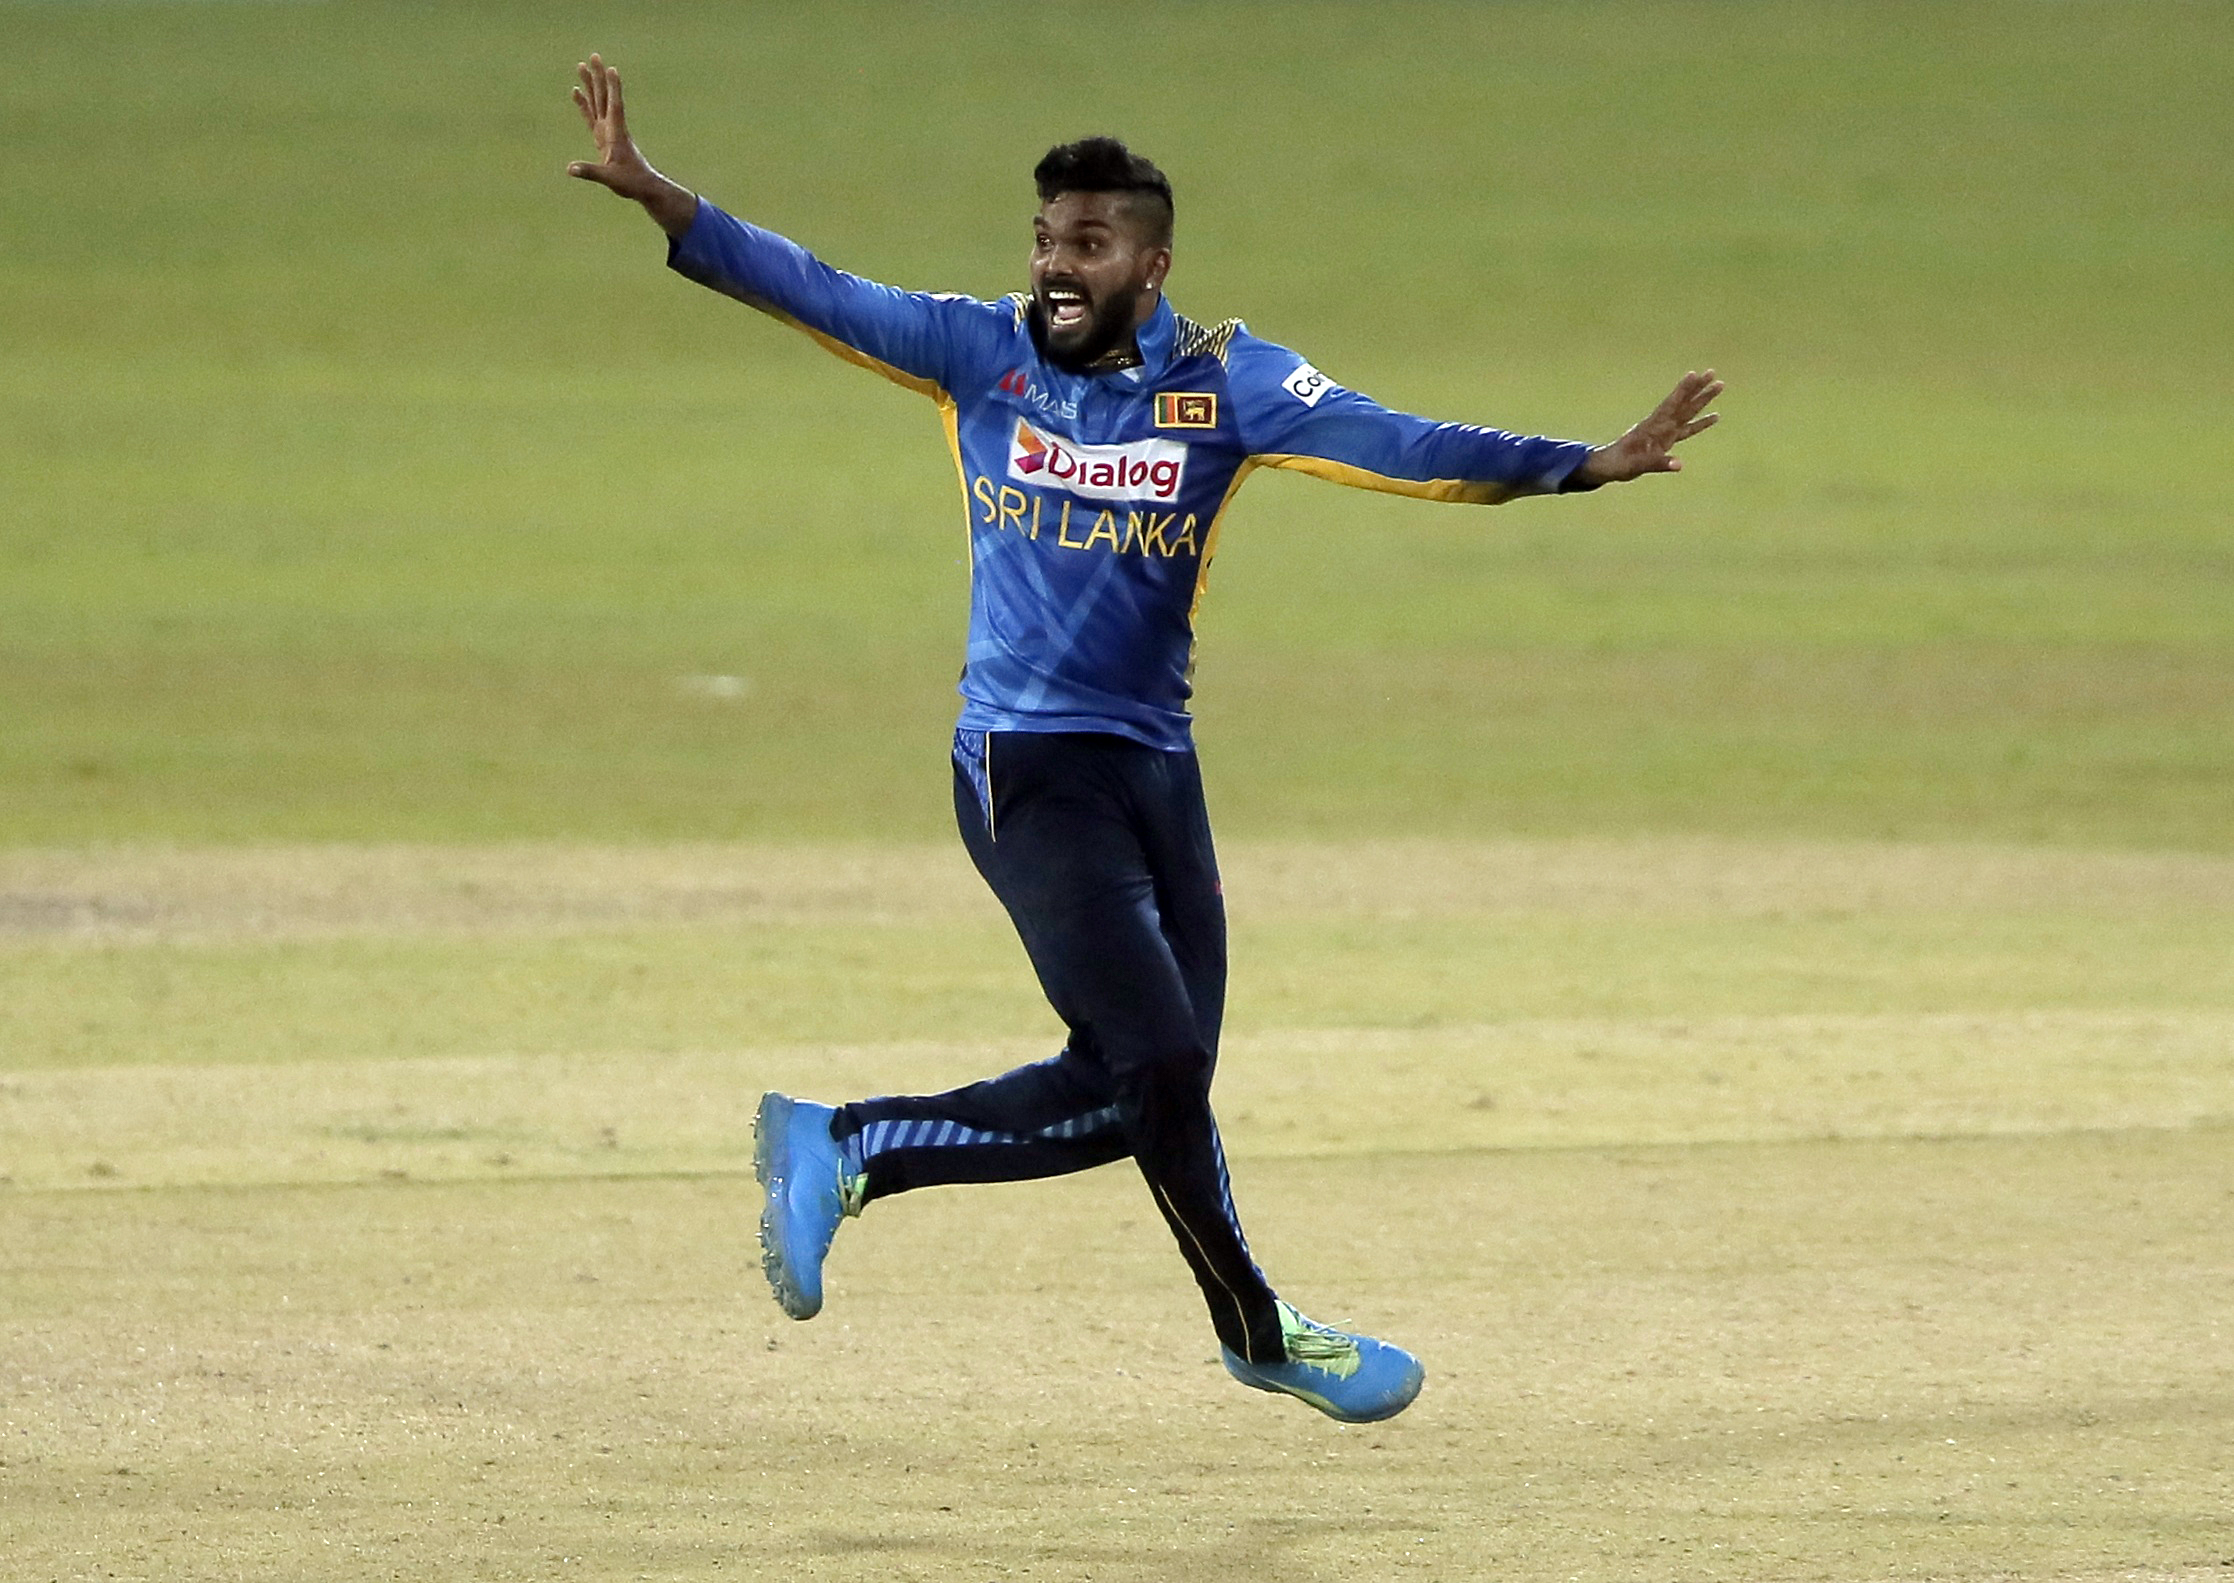 Cricket - Second One Day International - Sri Lanka v India - R. Premadasa International Cricket Stadium, Colombo, Sri Lanka - July 20, 2021 Sri Lanka's Wanindu Hasaranga appeals for a successful LBW wicket of India's Shikhar Dhawan REUTERS/Dinuka Liyanawatte